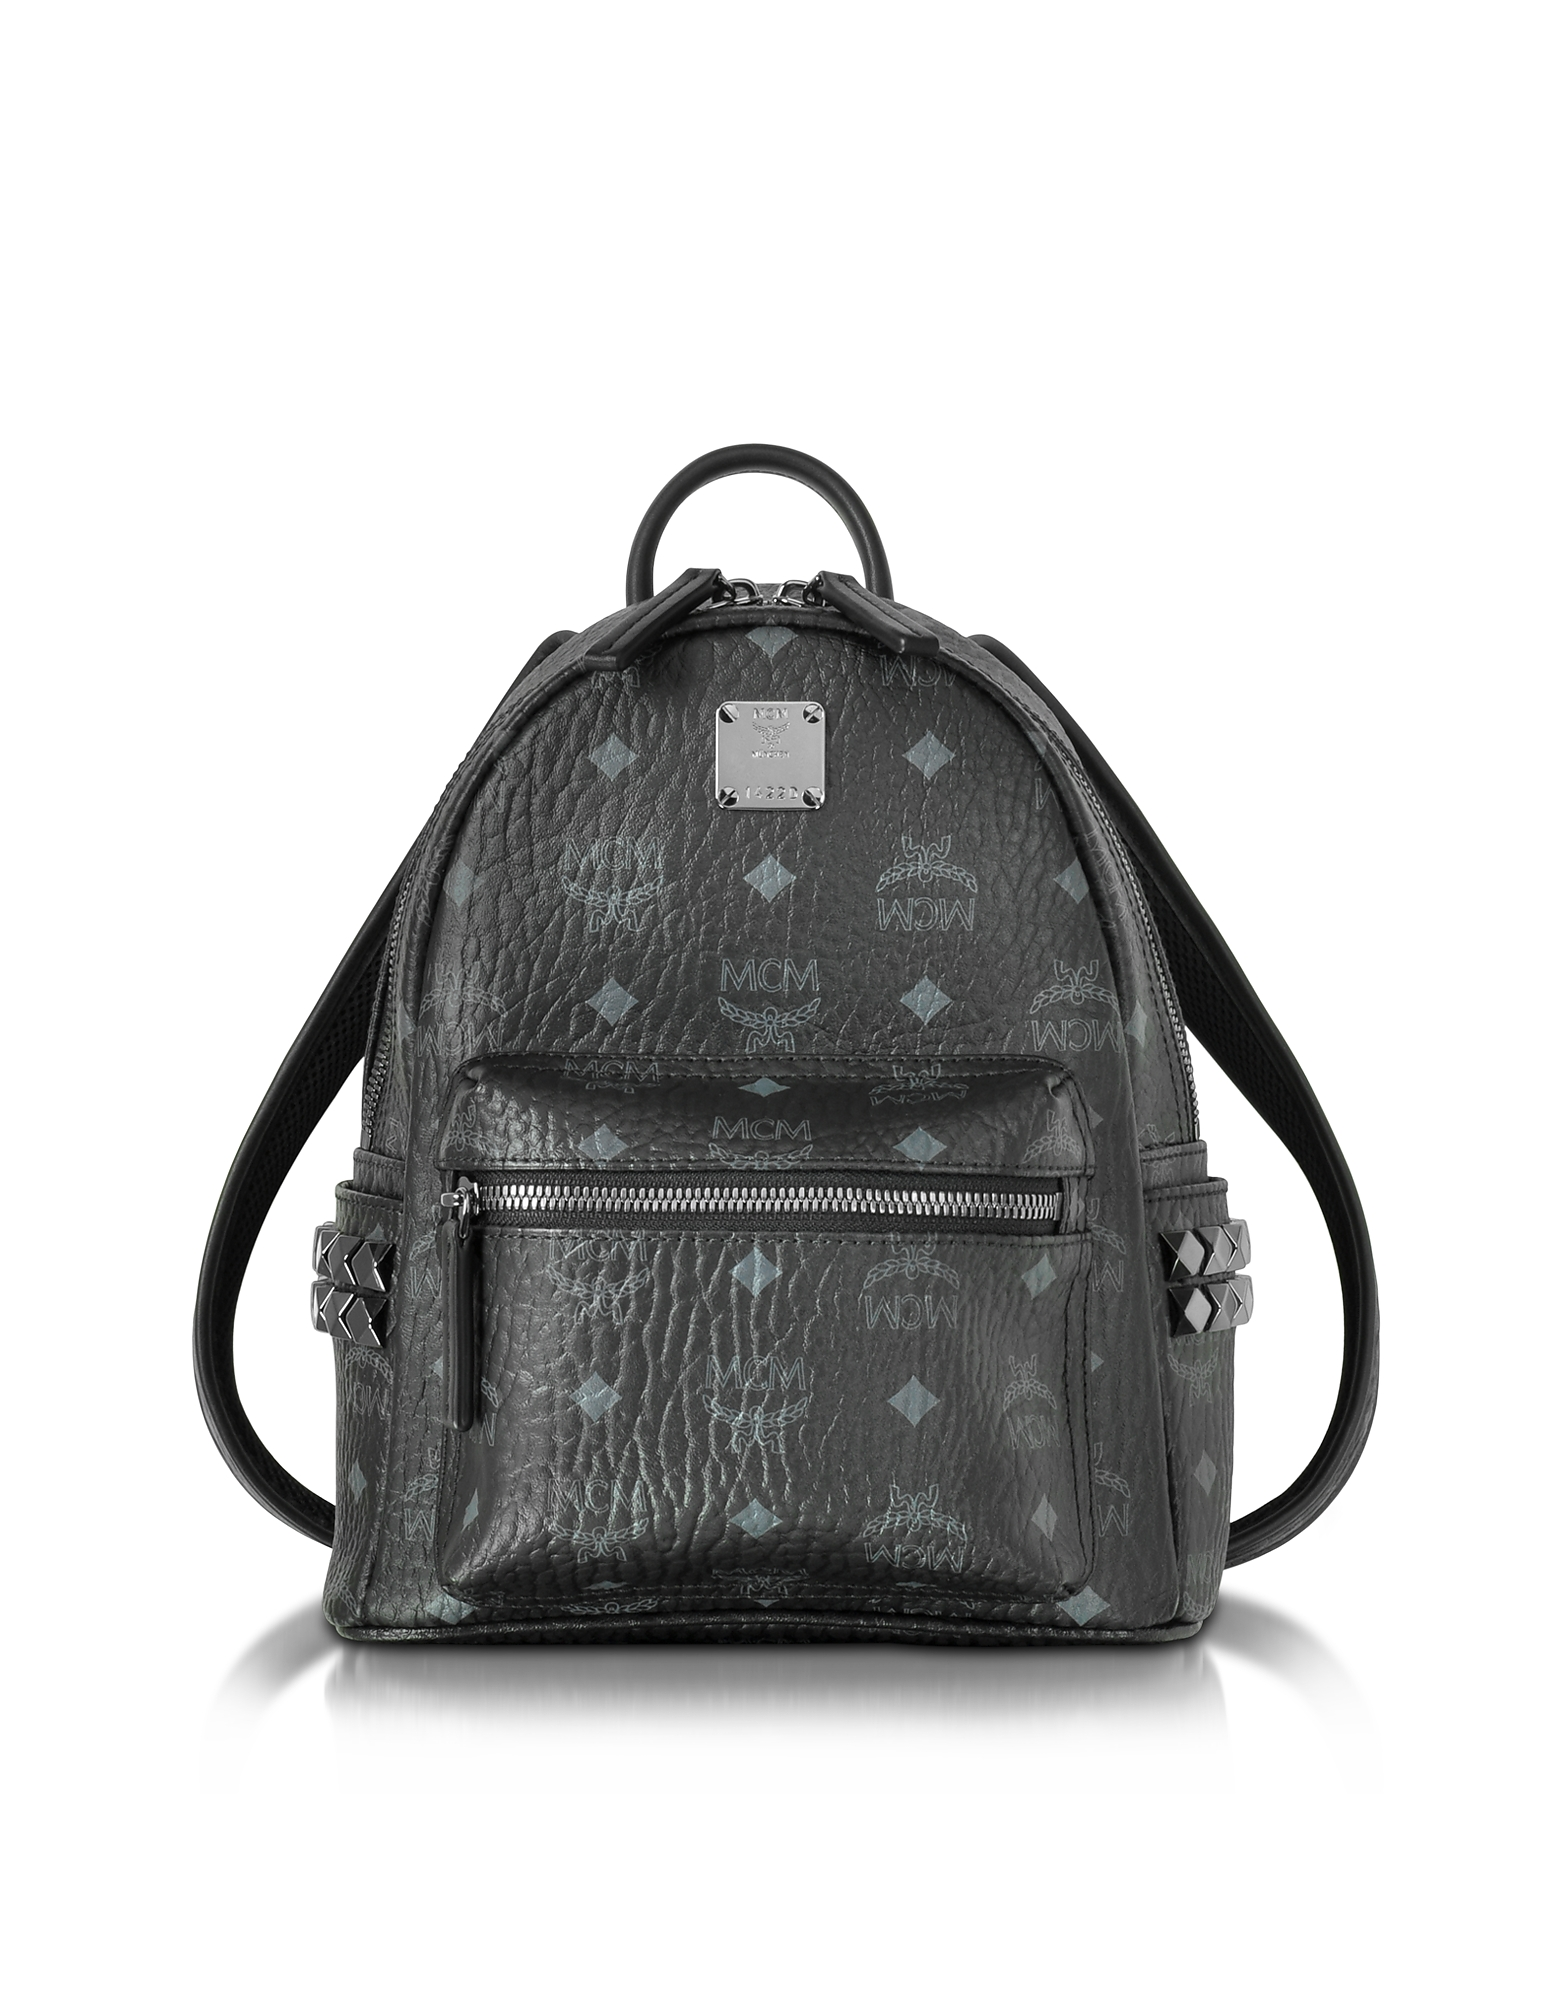 MCM Handbags, Black Mini Stark Backpack